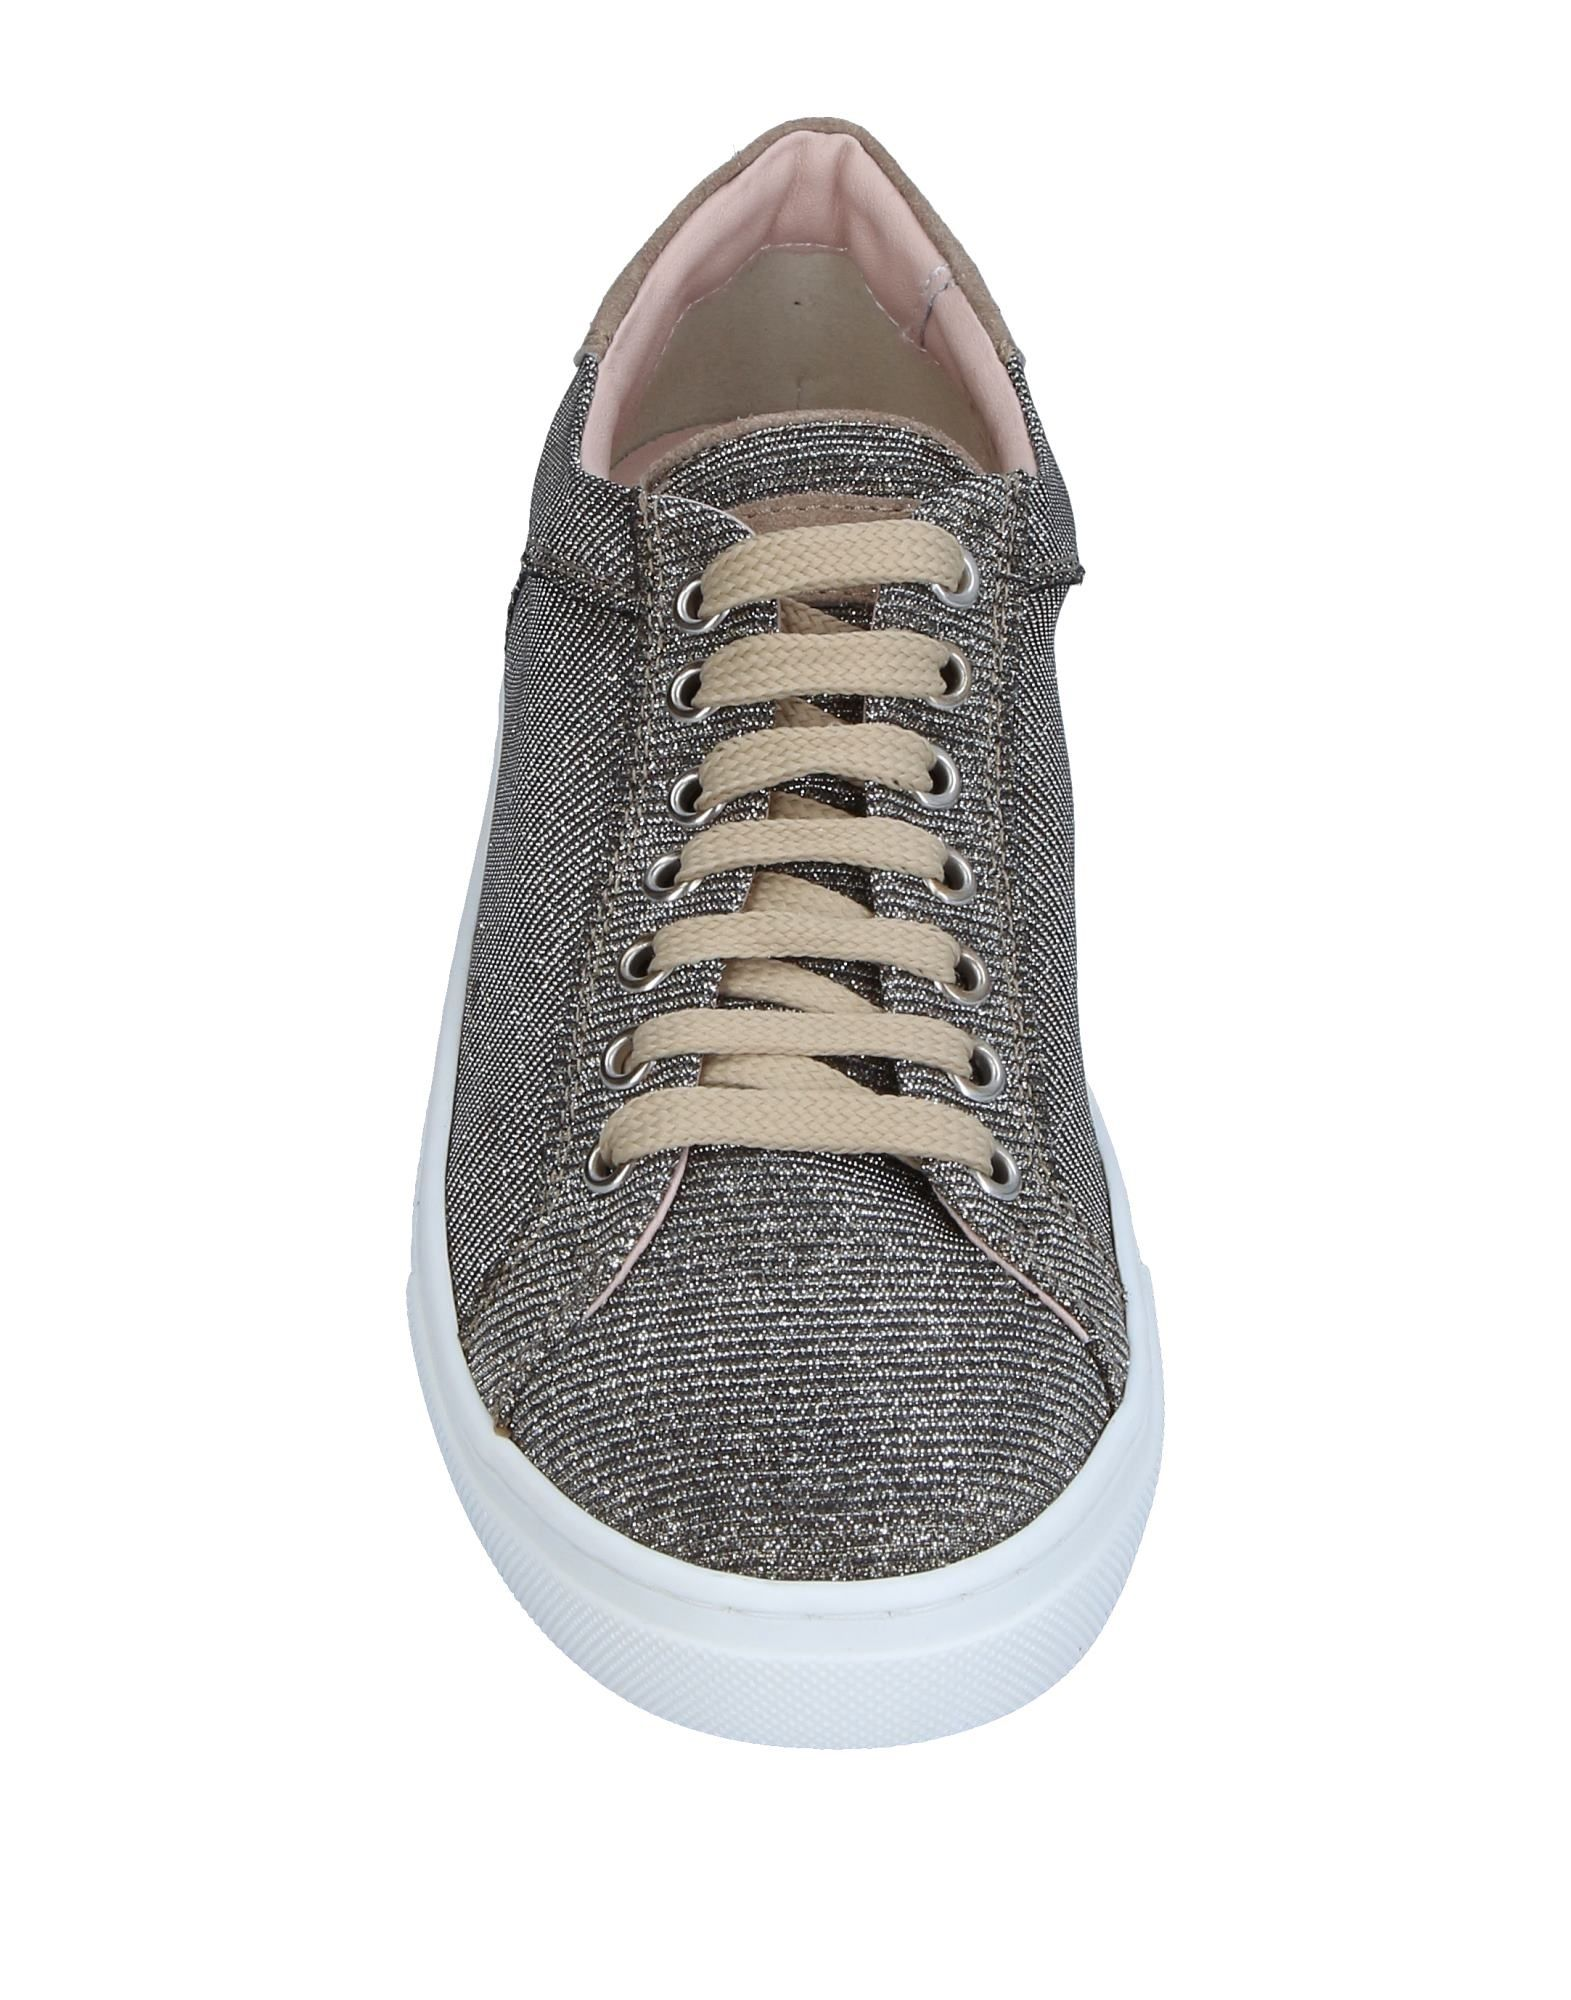 Tosca Blu Damen Shoes Sneakers Damen Blu  11326490XM  3fdd75